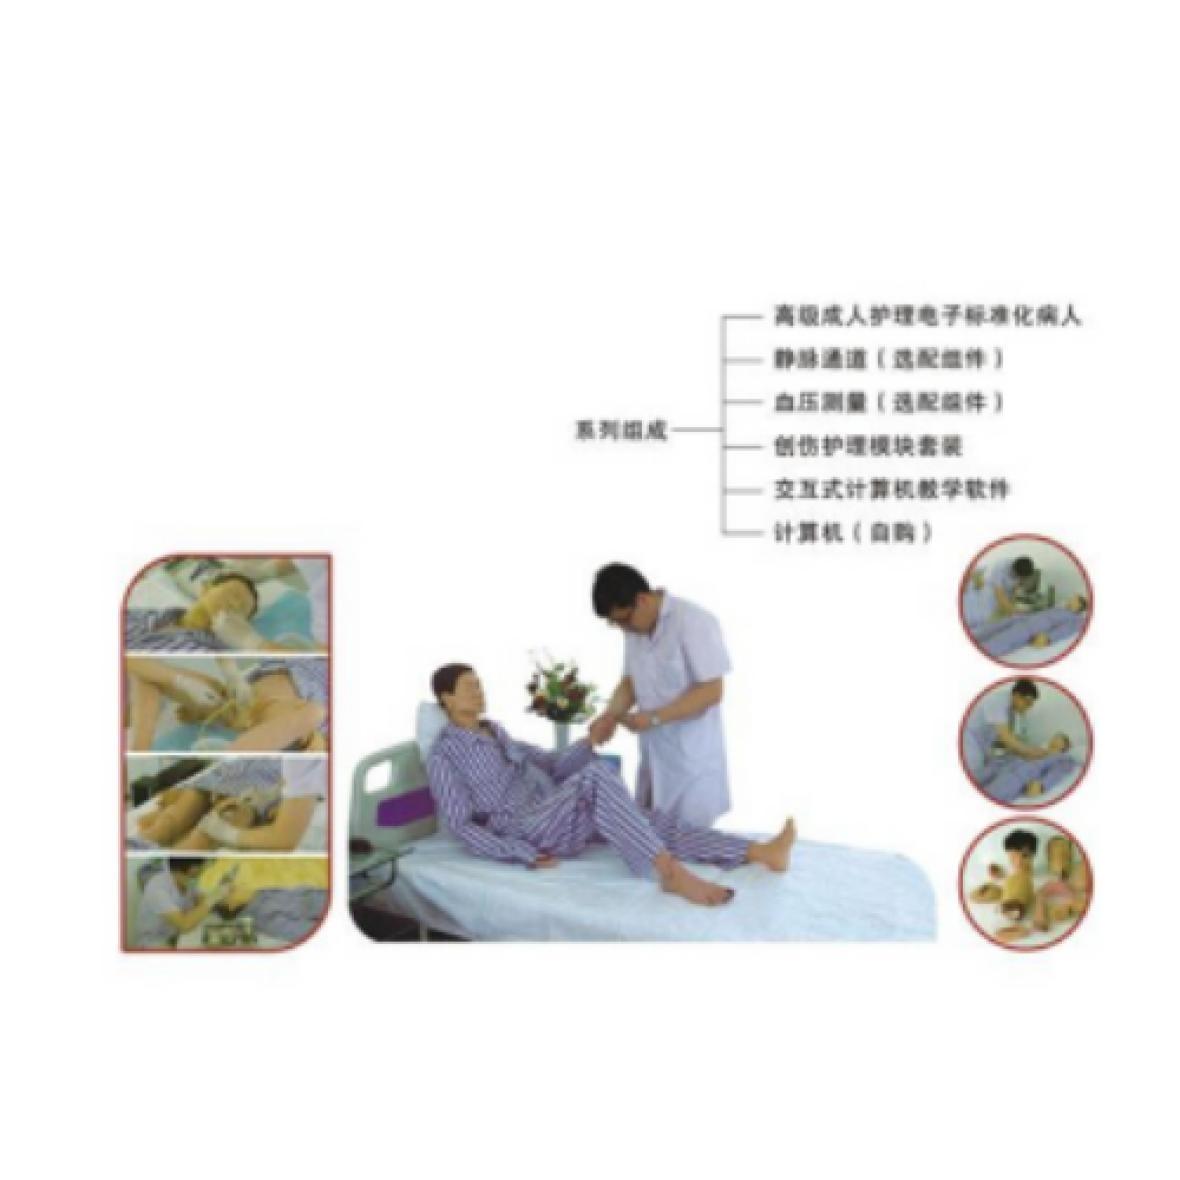 NM2104 全功能护理仿真标准化病人